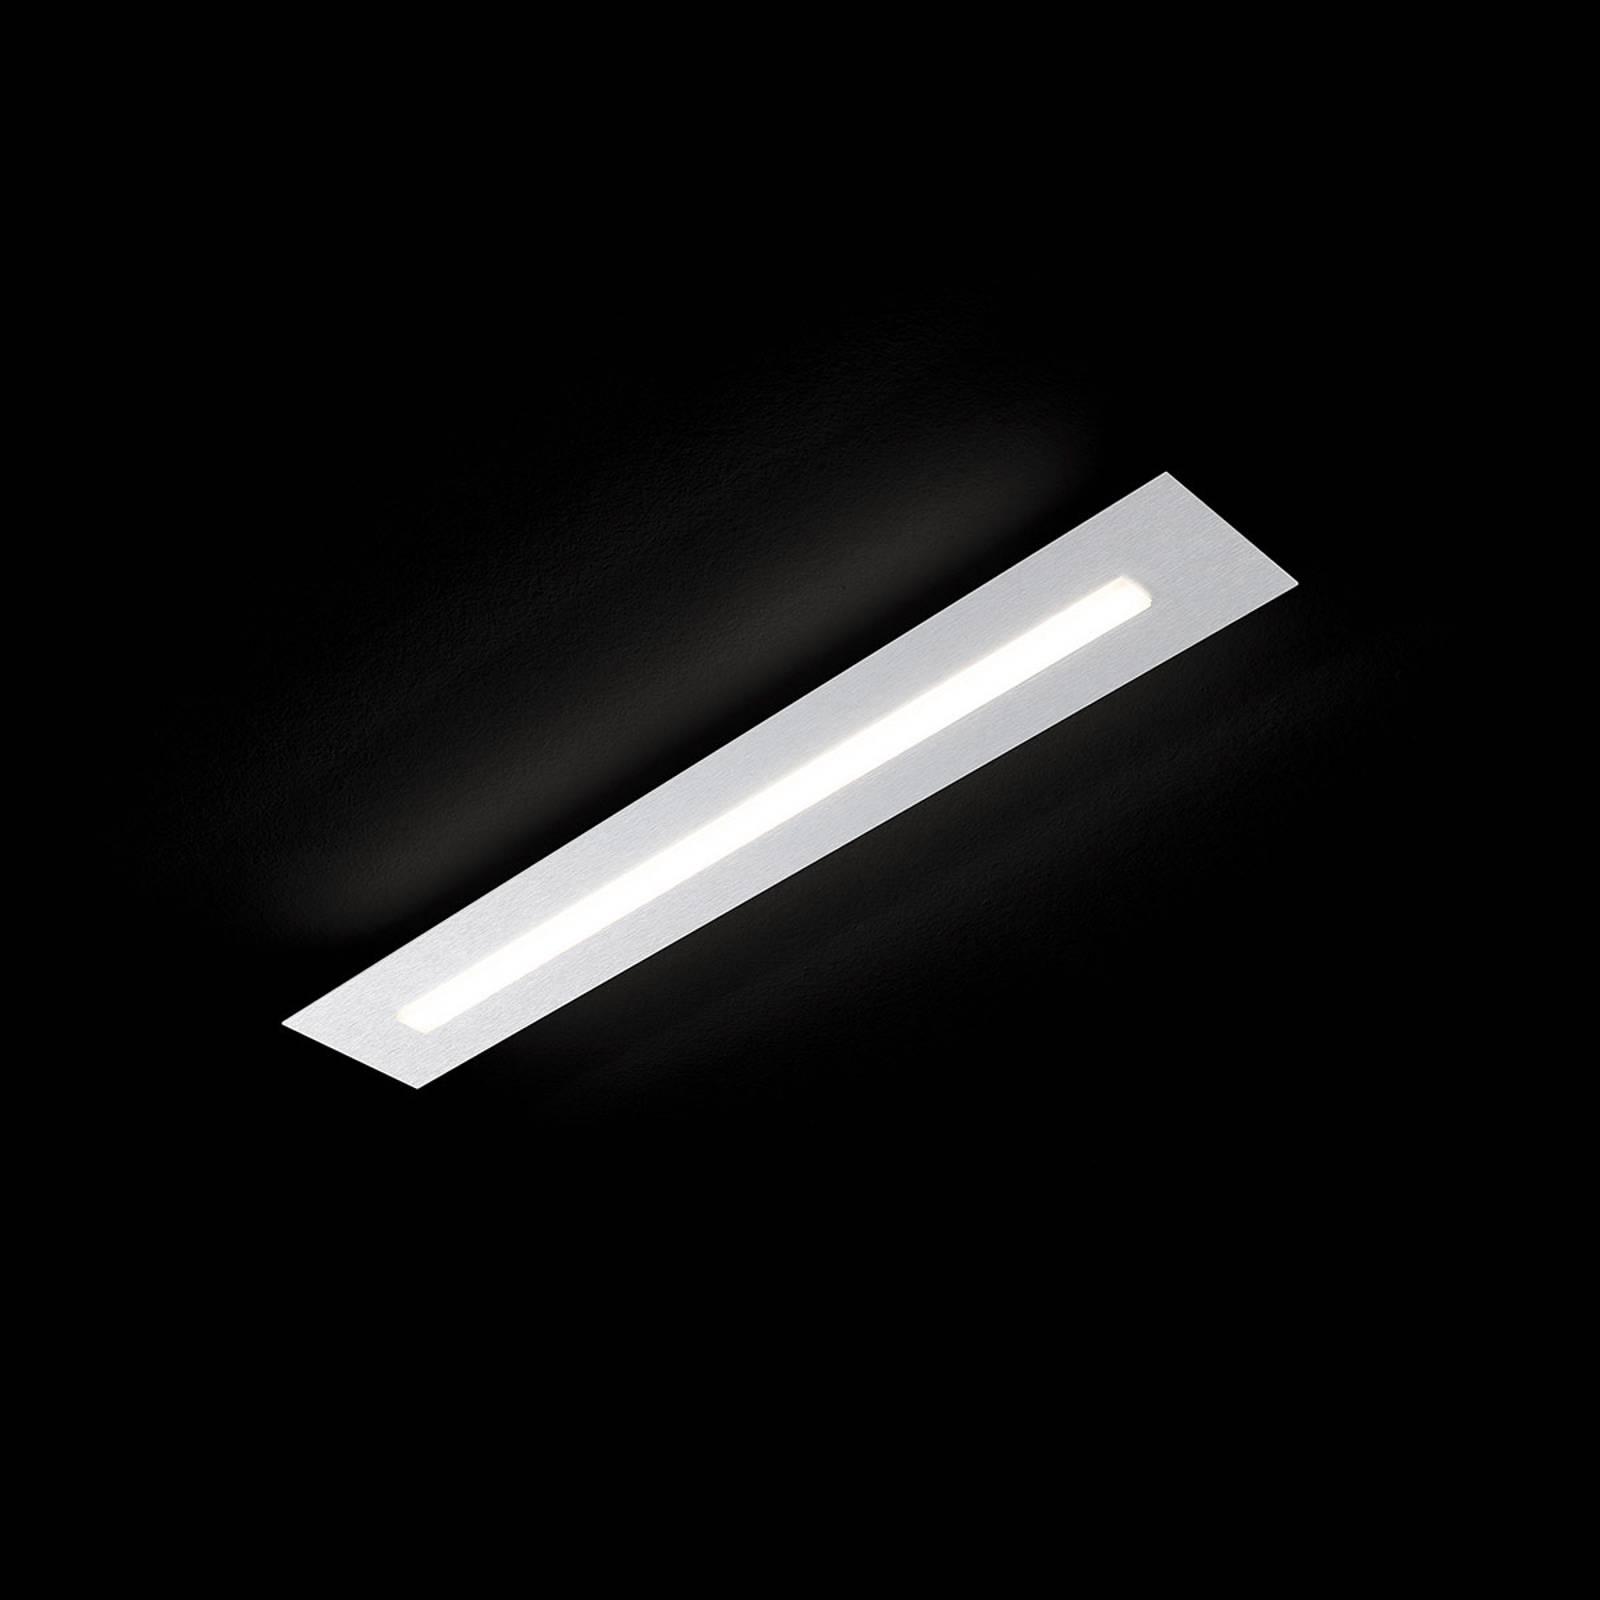 GROSSMANN Fis LED-kattovalaisin, 57 cm